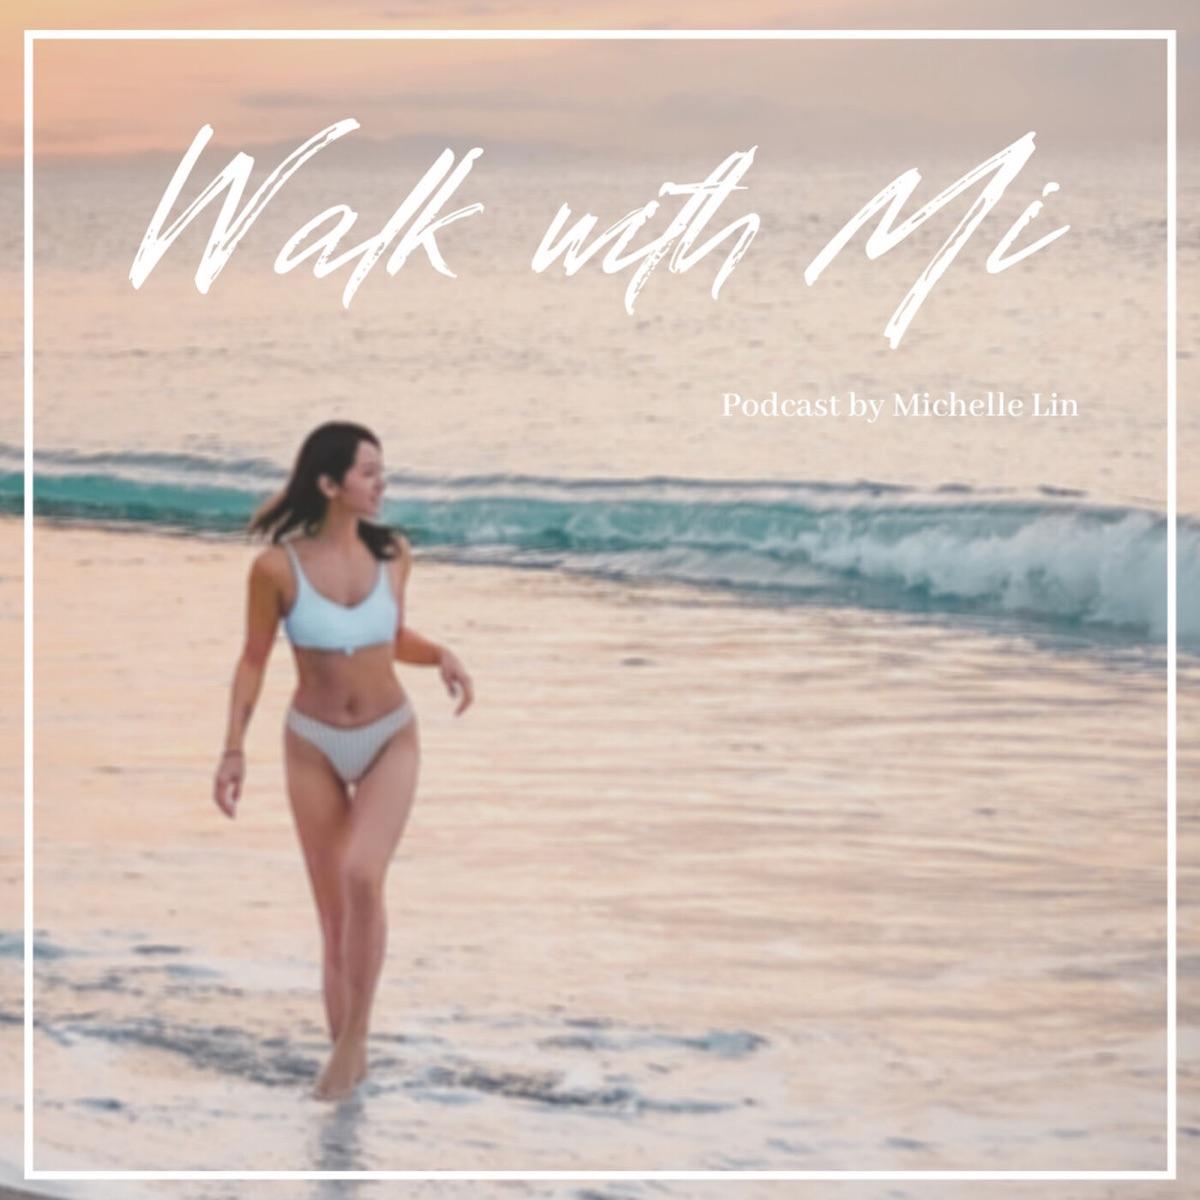 陪我散步 Walk with Mi